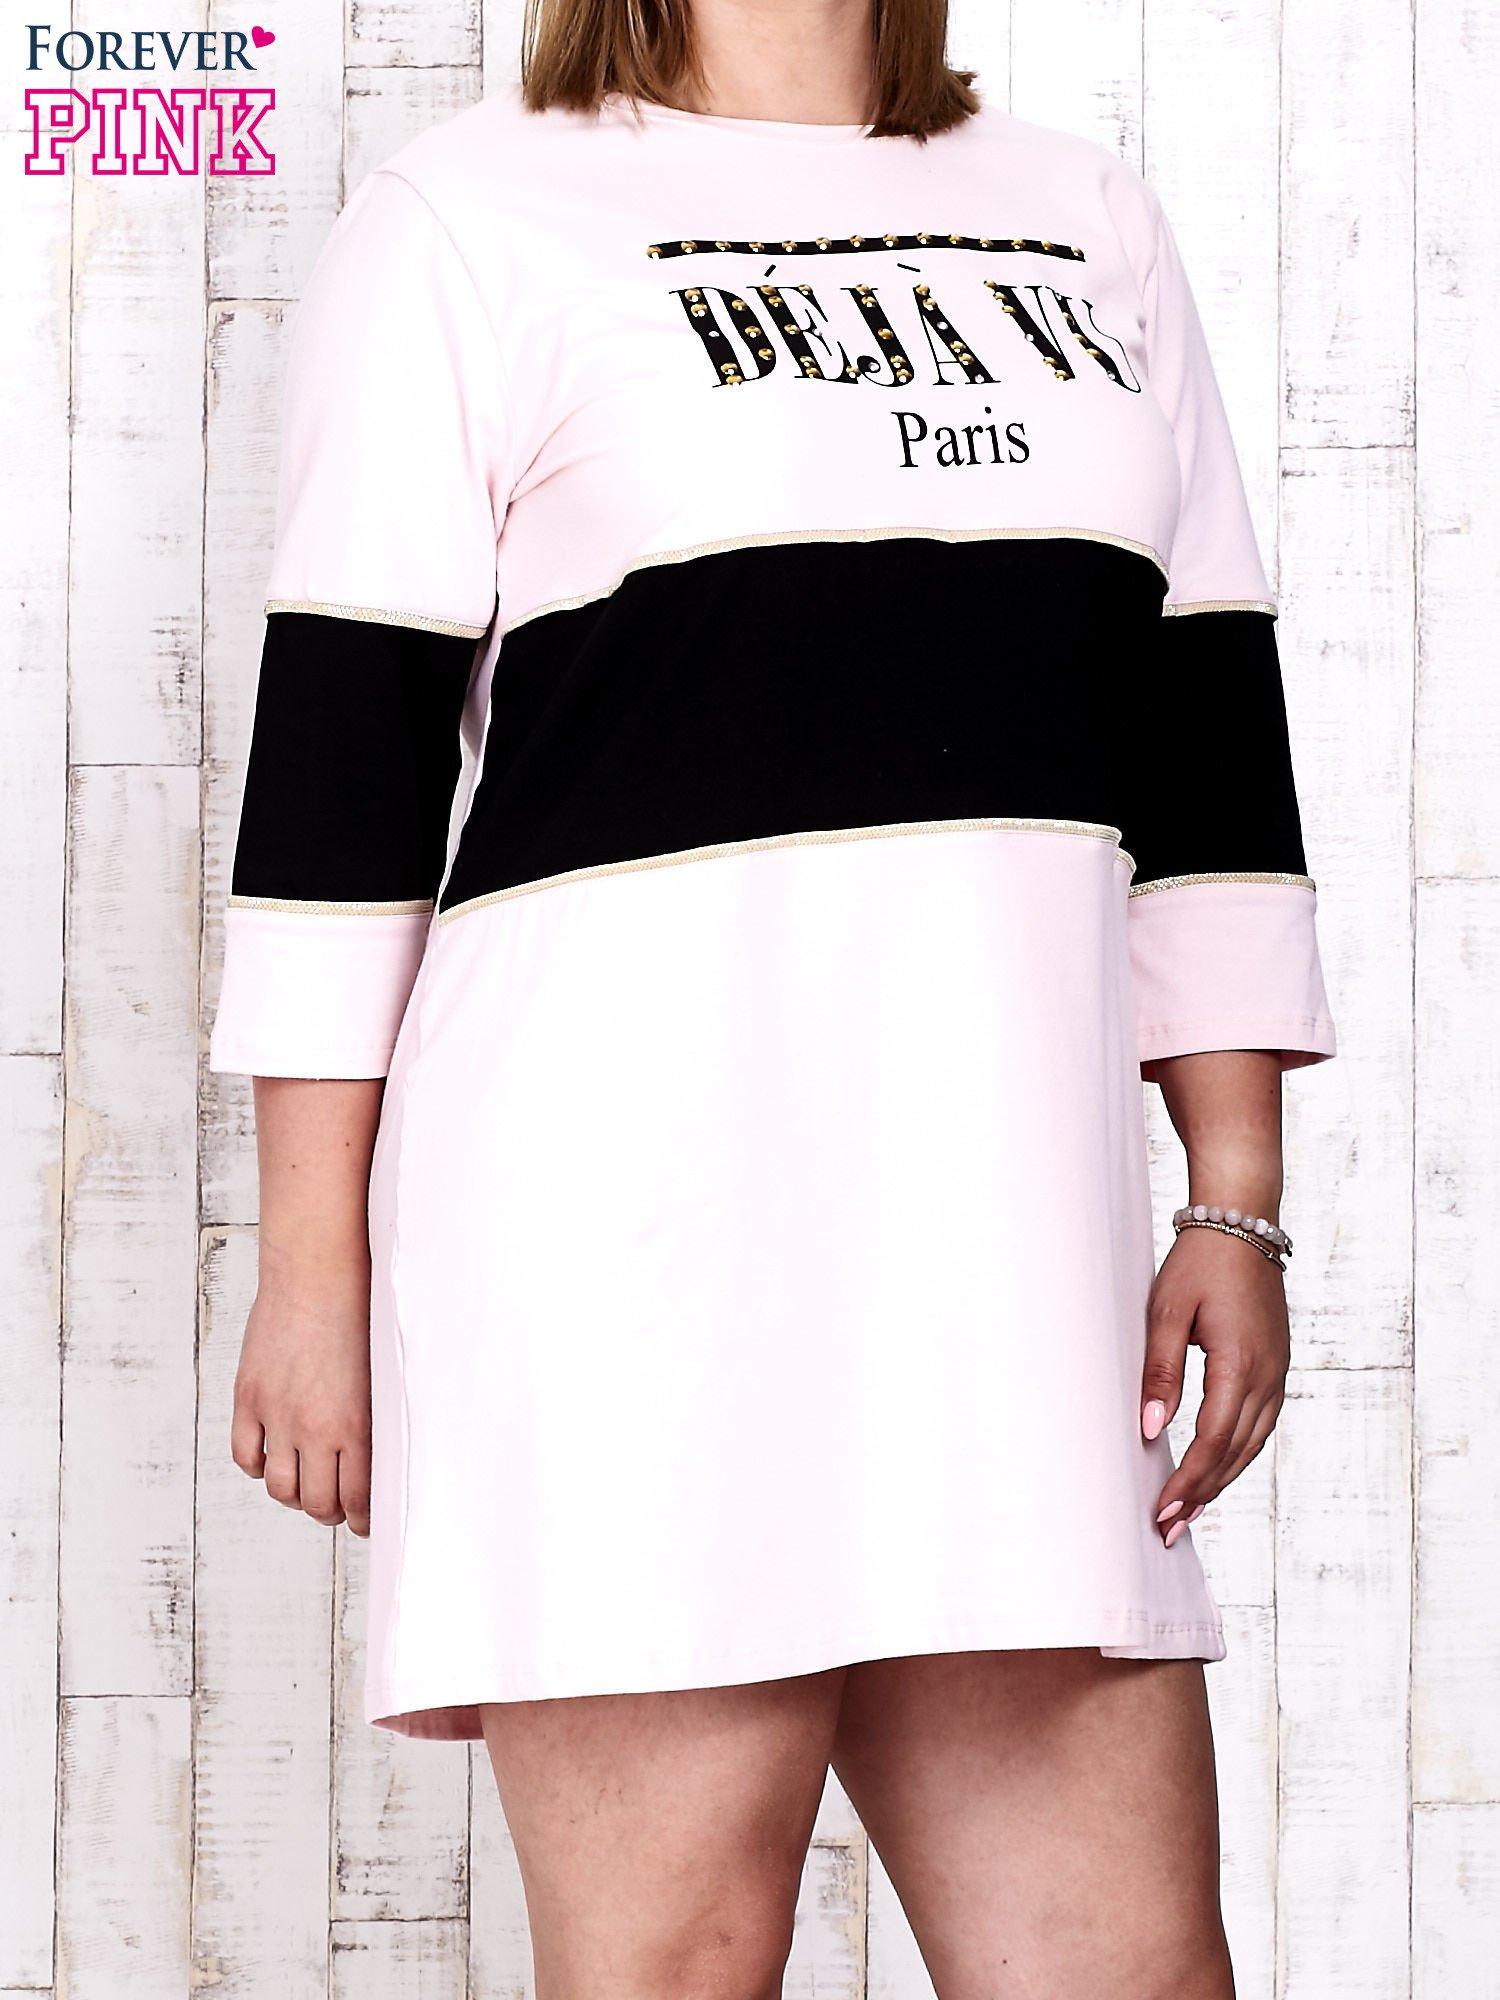 Jasnoróżowa sukienka dresowa z napisem DÉJÀ VU PLUS SIZE                                  zdj.                                  1